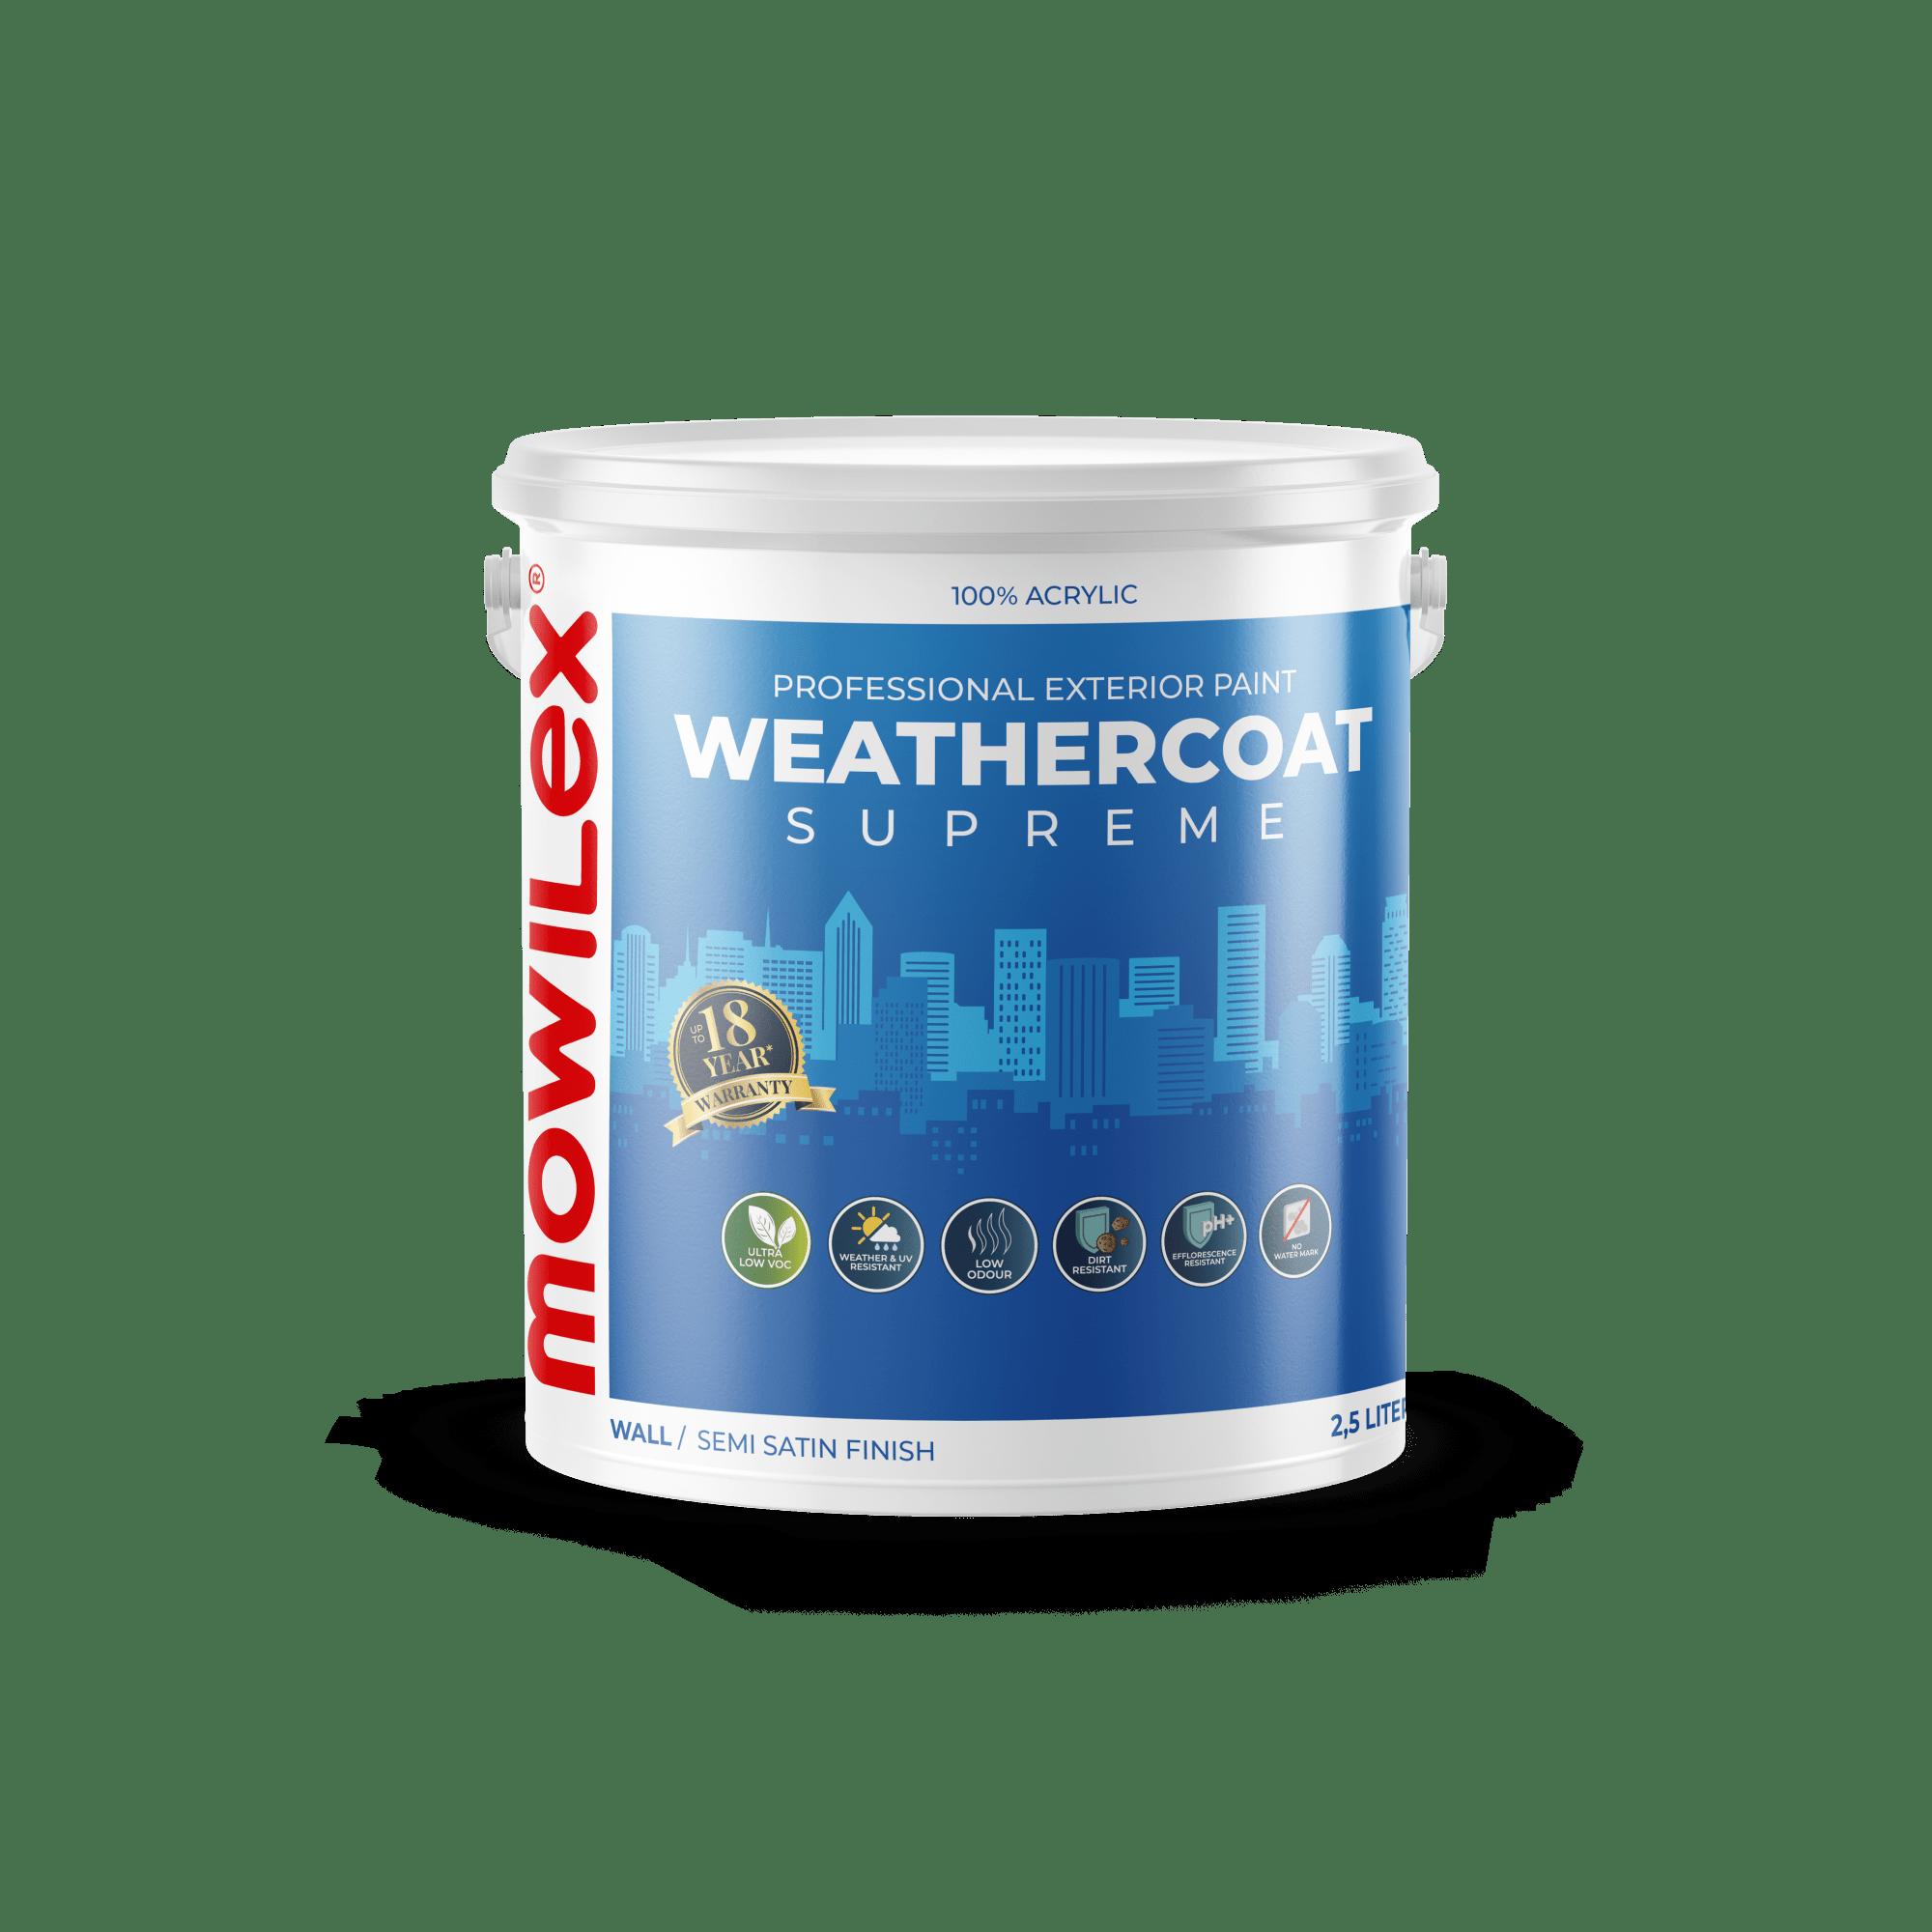 Mowilex Weathercoat Supreme